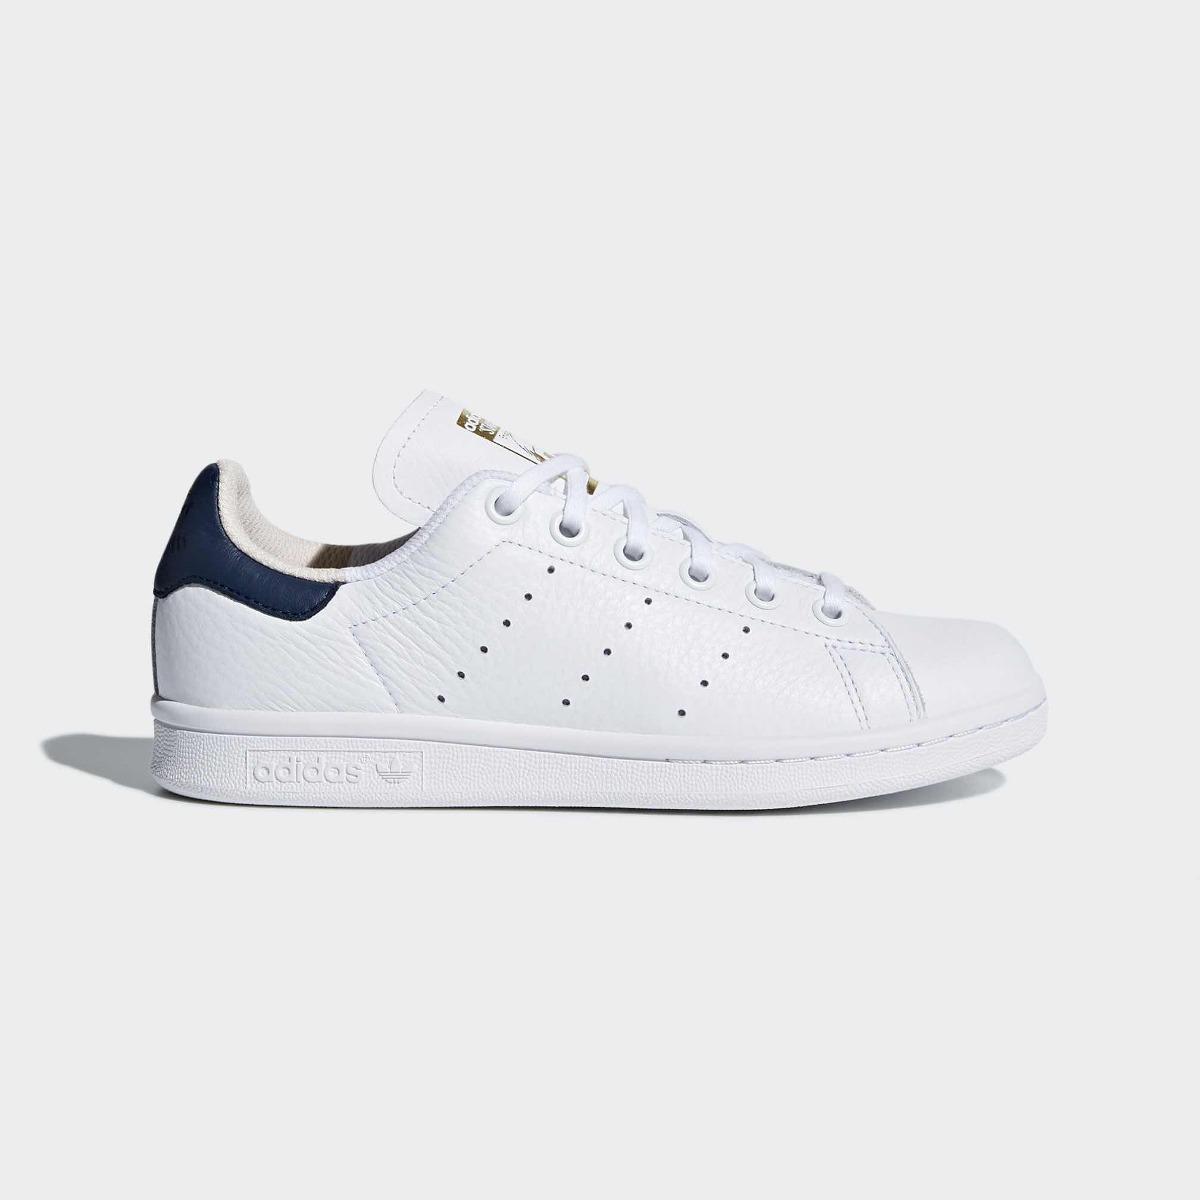 cbd3c9f23e3 tenis-adidas-originals-stan-smith -cm8188-dancing-originals-D NQ NP 788257-MLM27820496331 072018-F.jpg